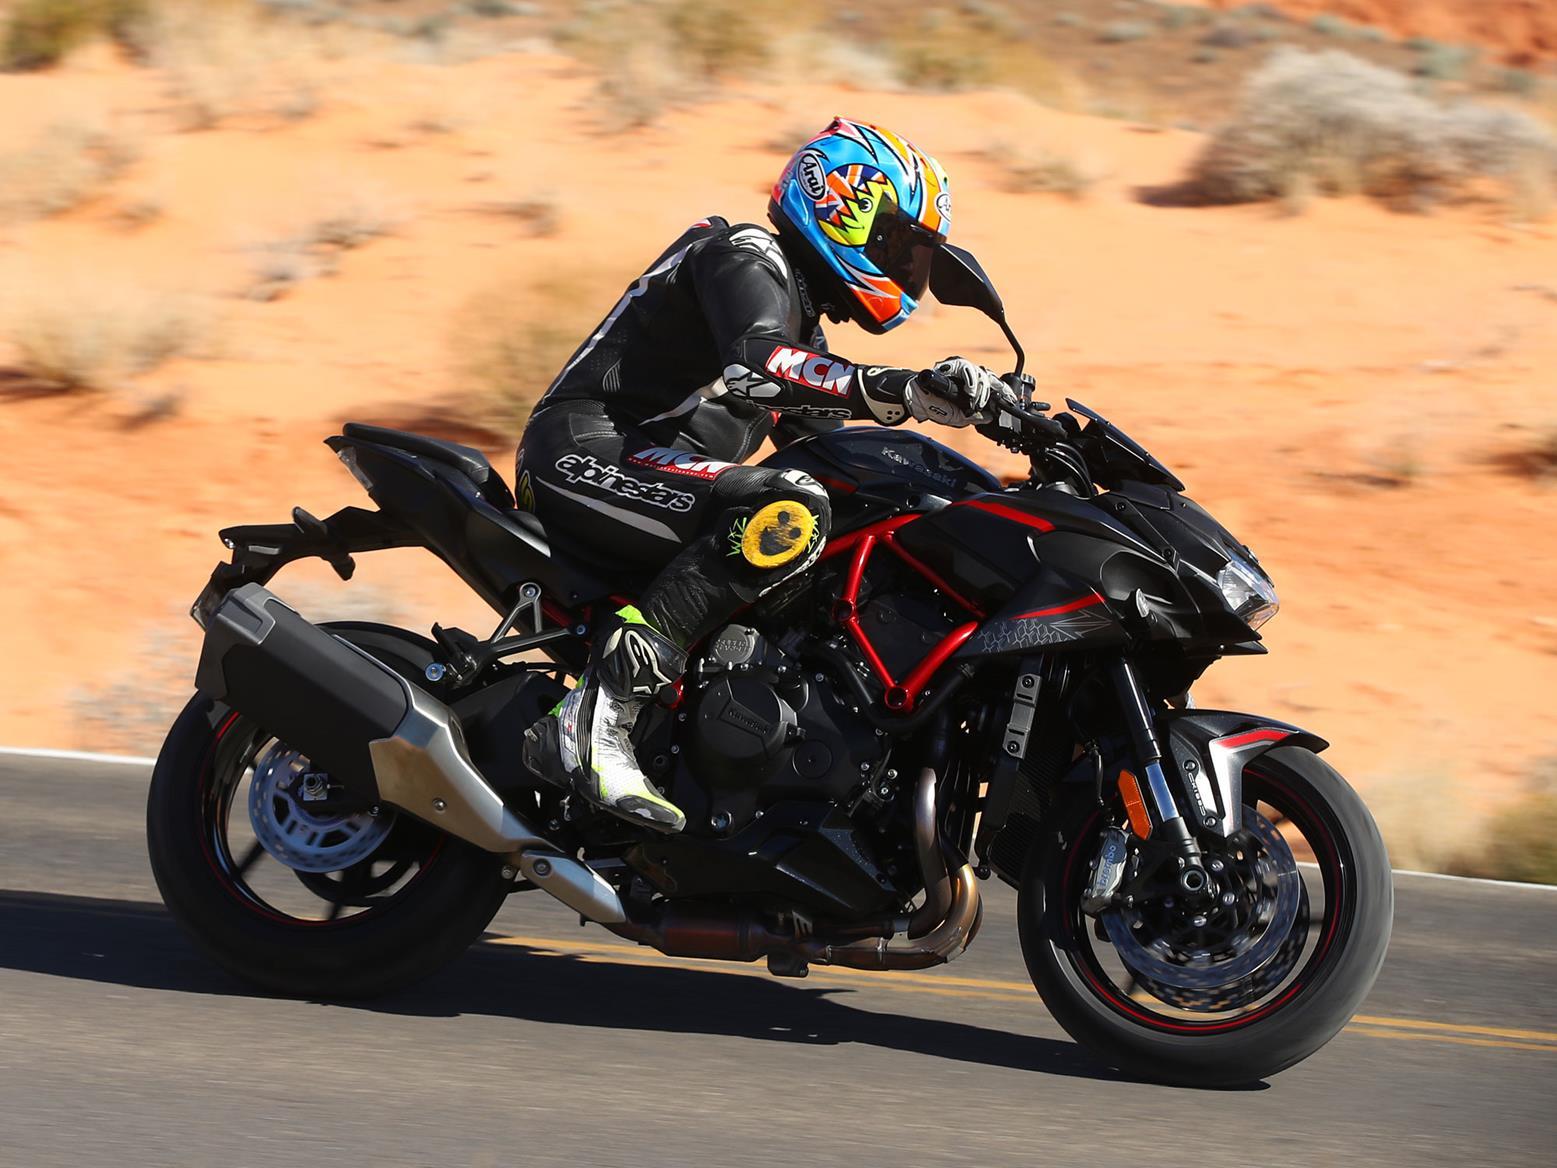 Riding the 2020 Kawasaki Z H2